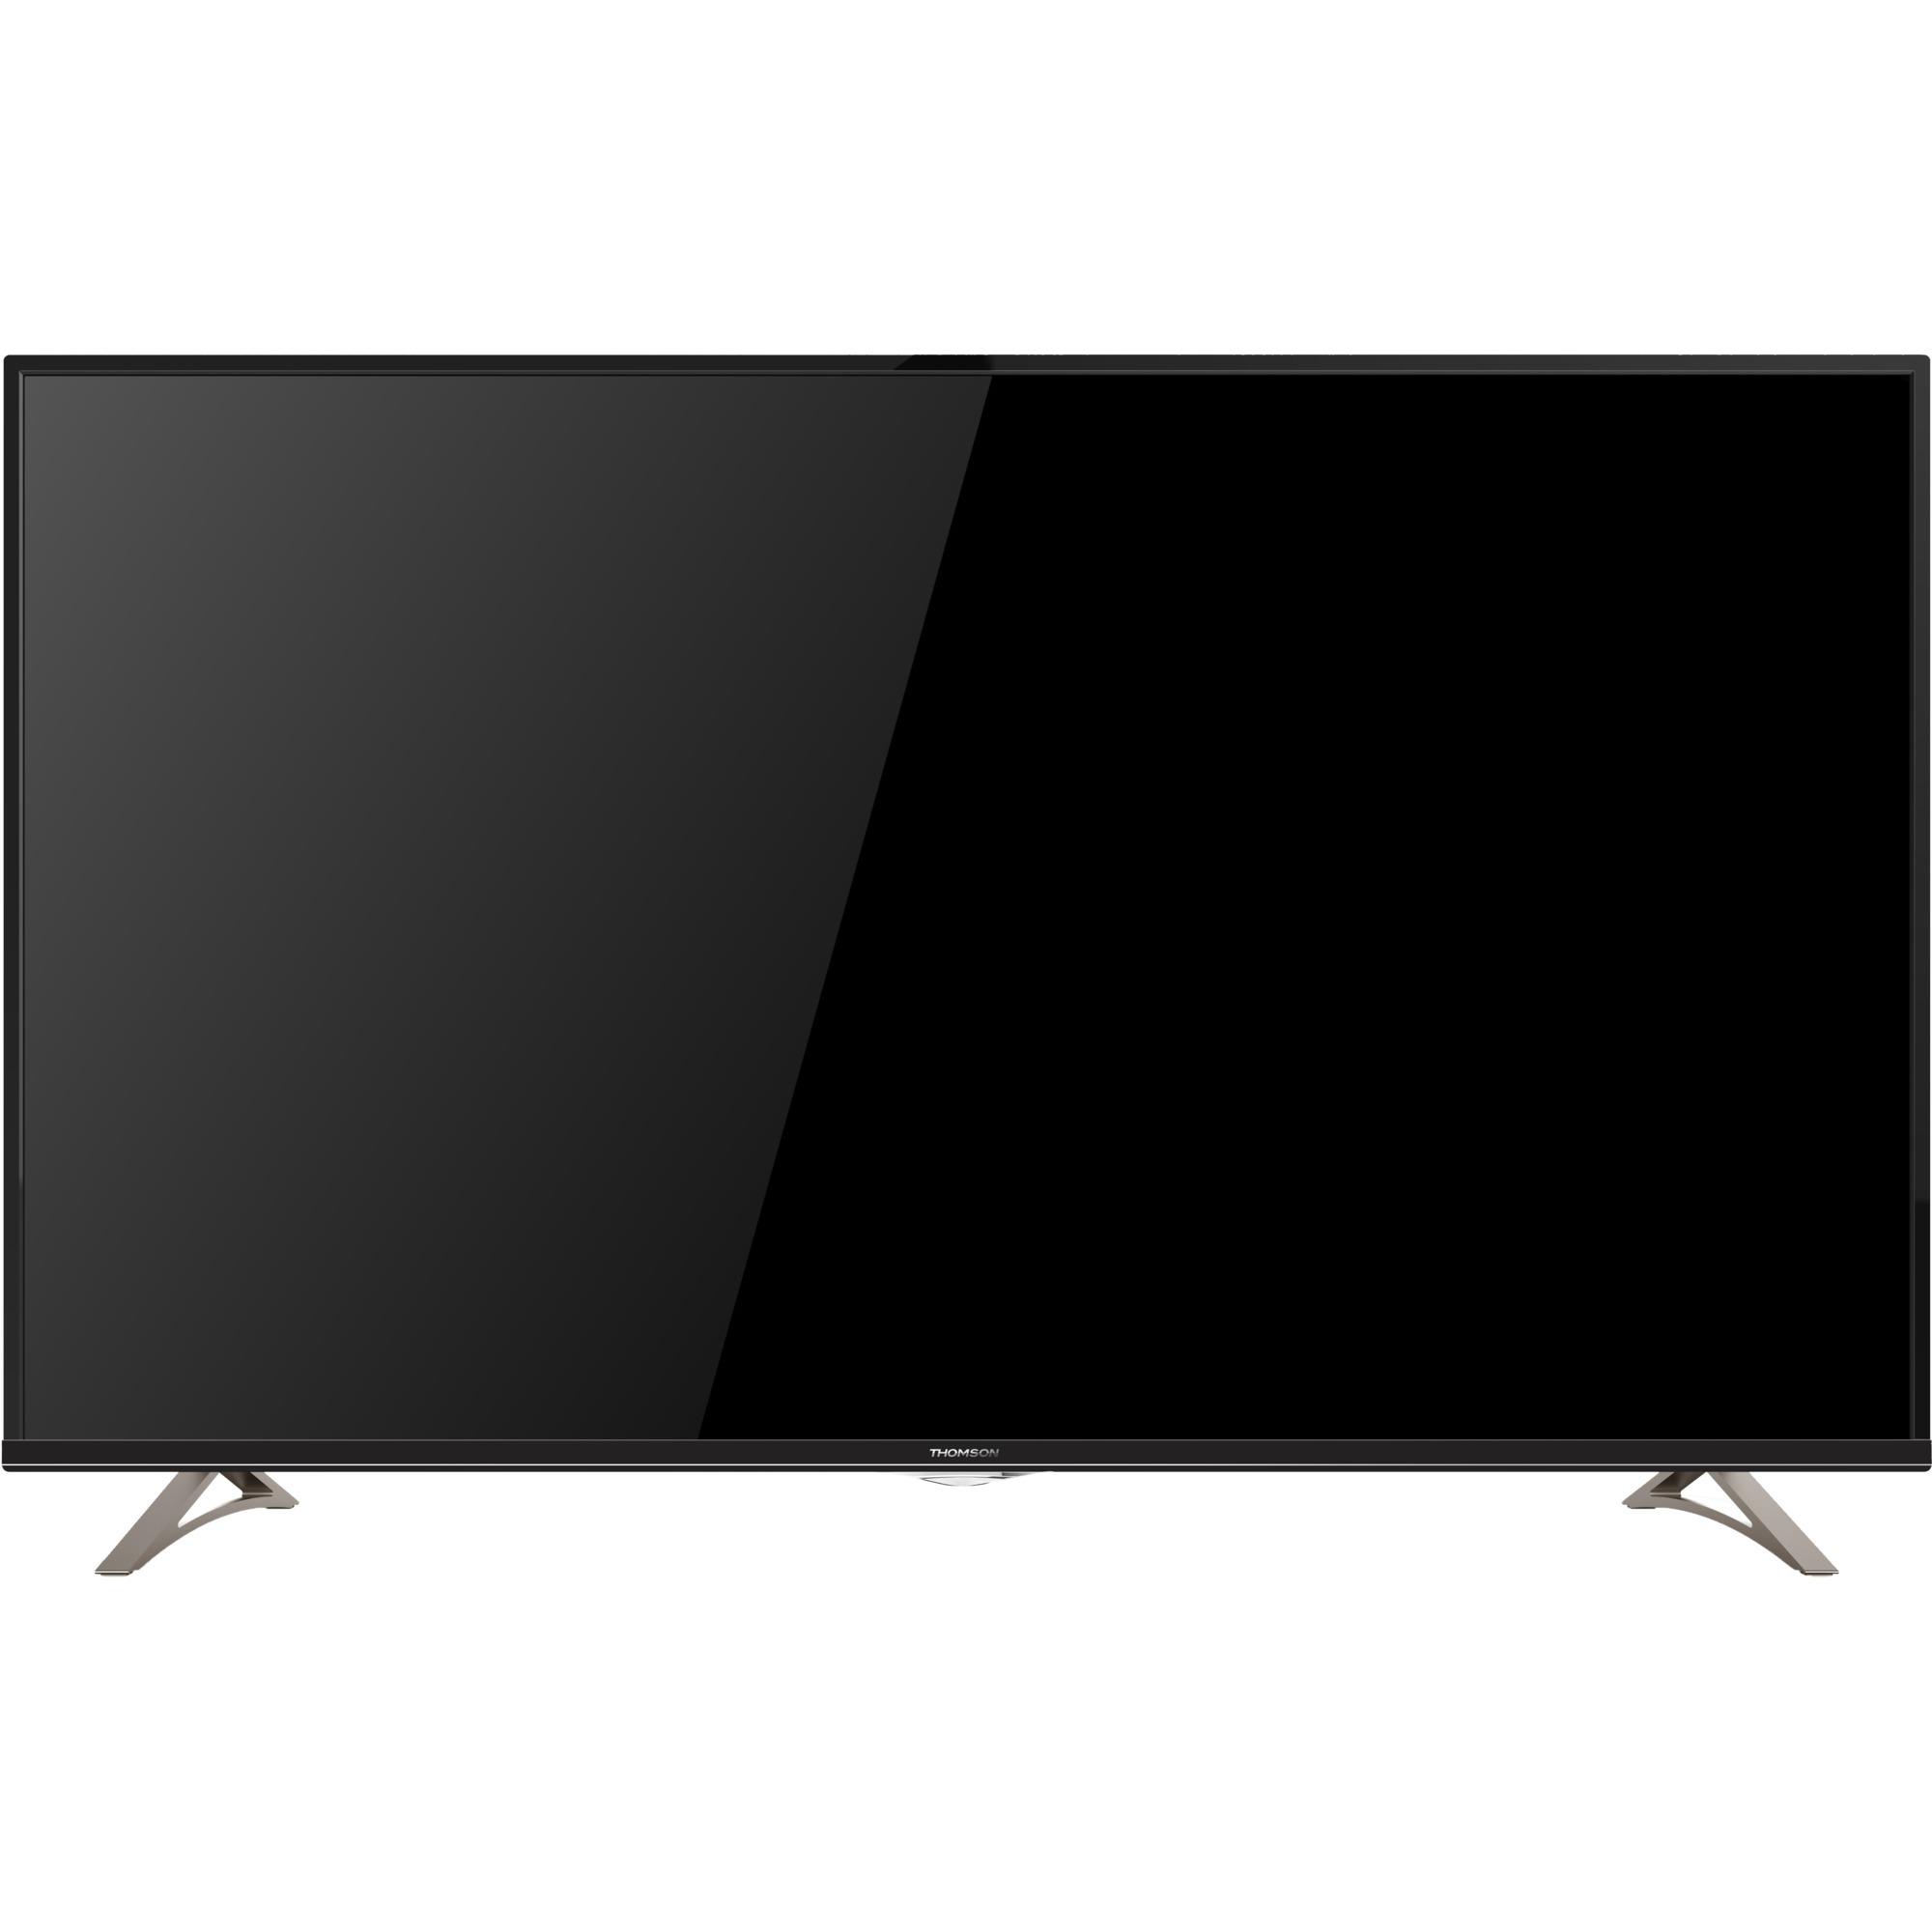 Thomson 40ub6406 smart tv led 40 pollici prezzo e - Unieuro porta tv ...